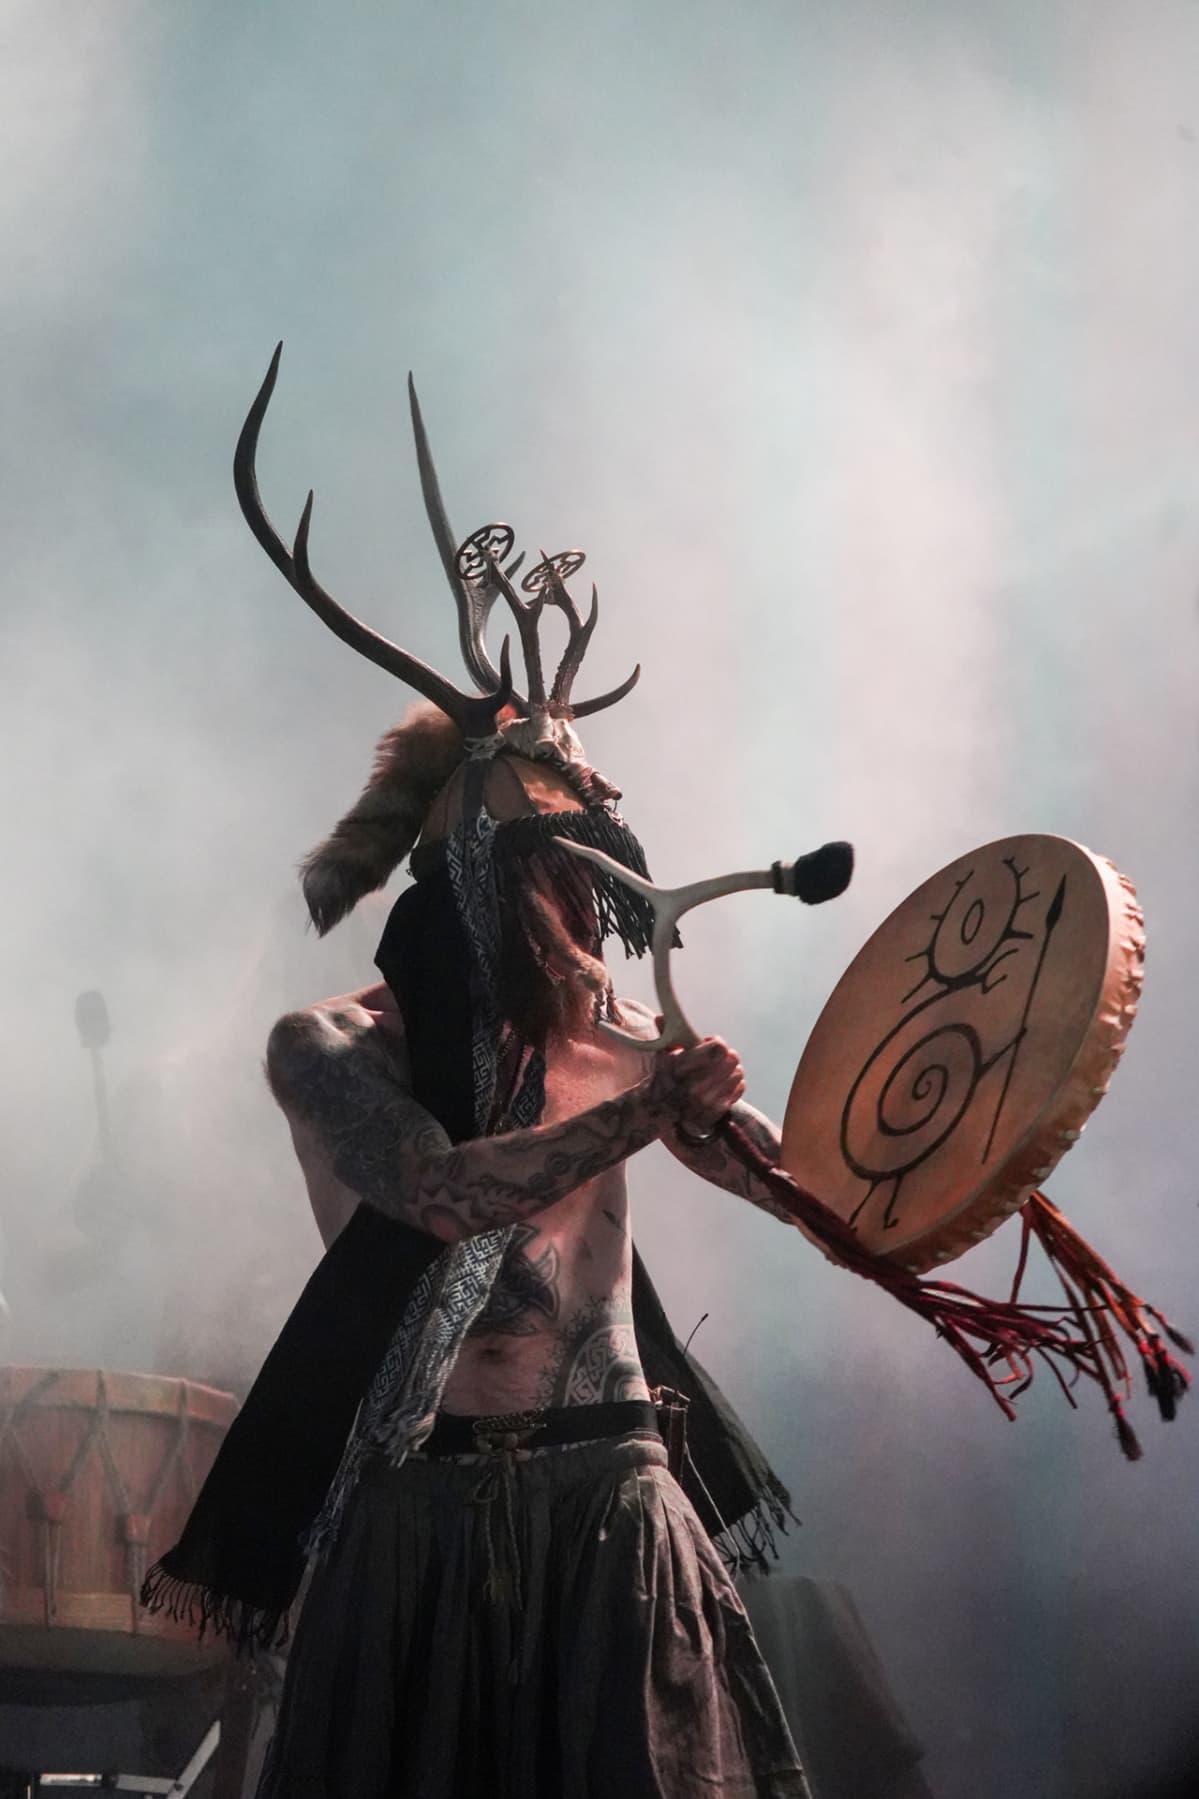 Heilung, shamanismi, Tuska